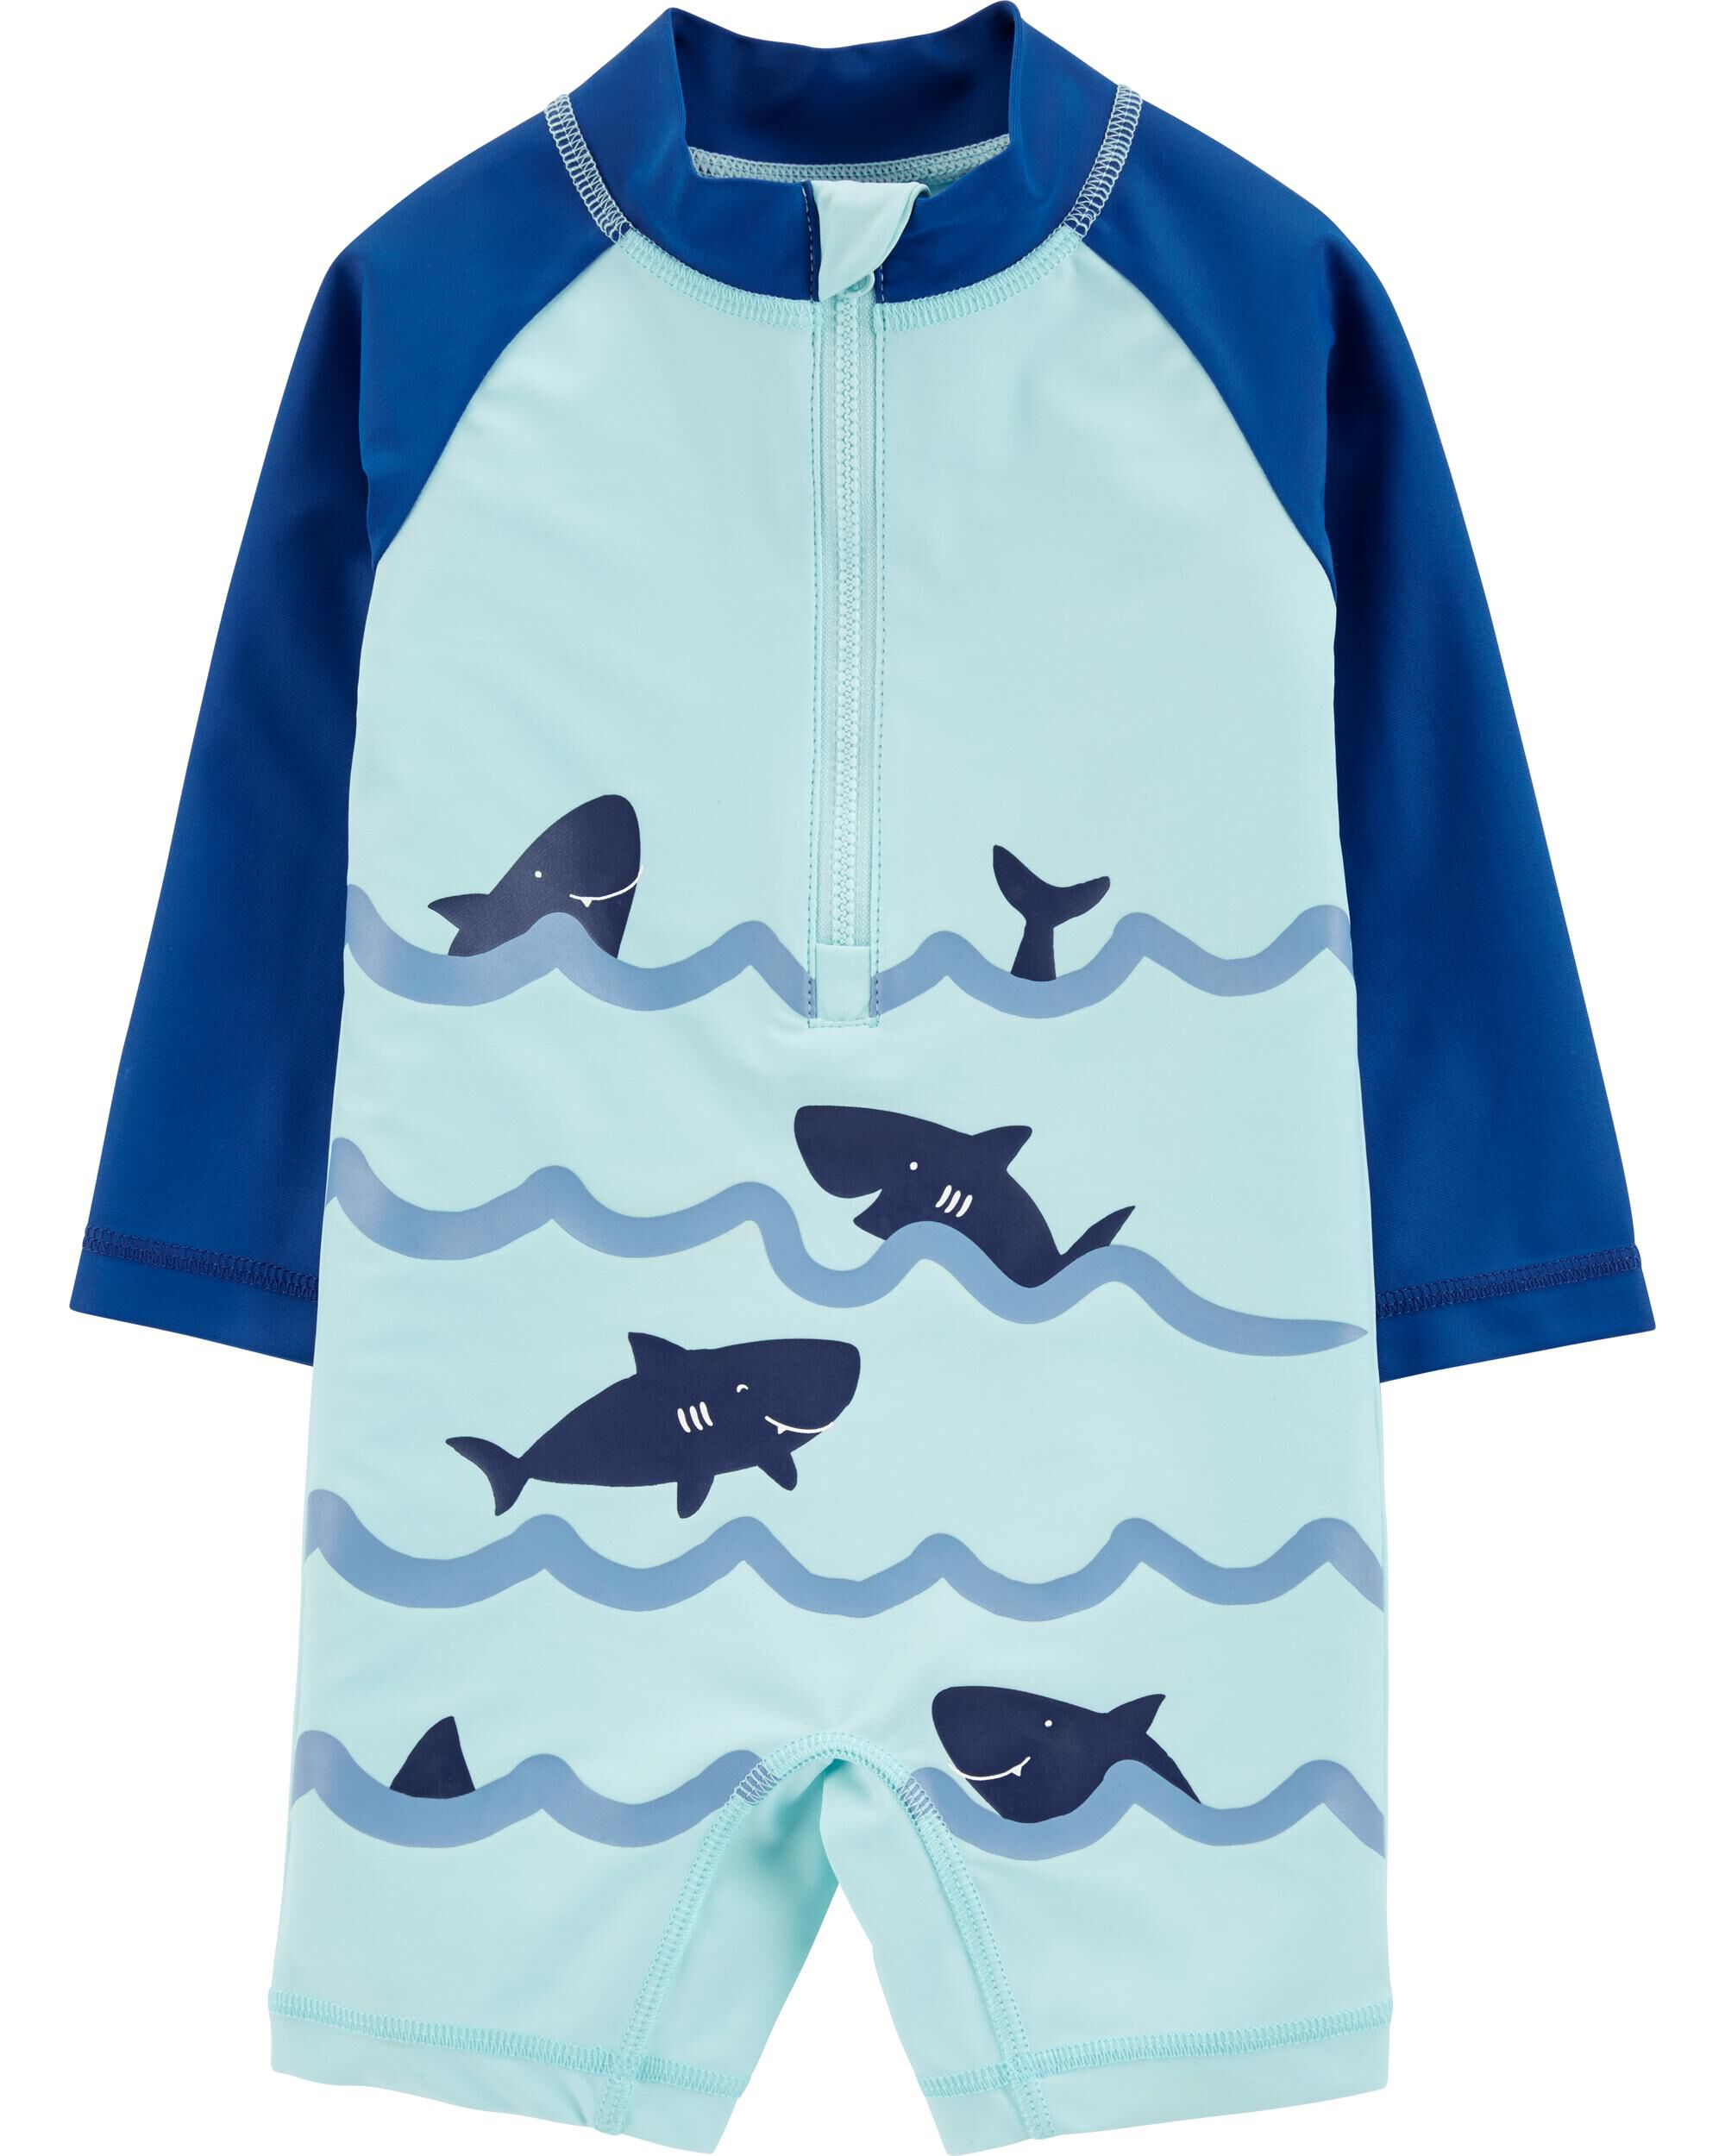 Carter/'s Infant Boys Green Shark Rash Guard Set Size 3//6M 6//9M 12M 18M